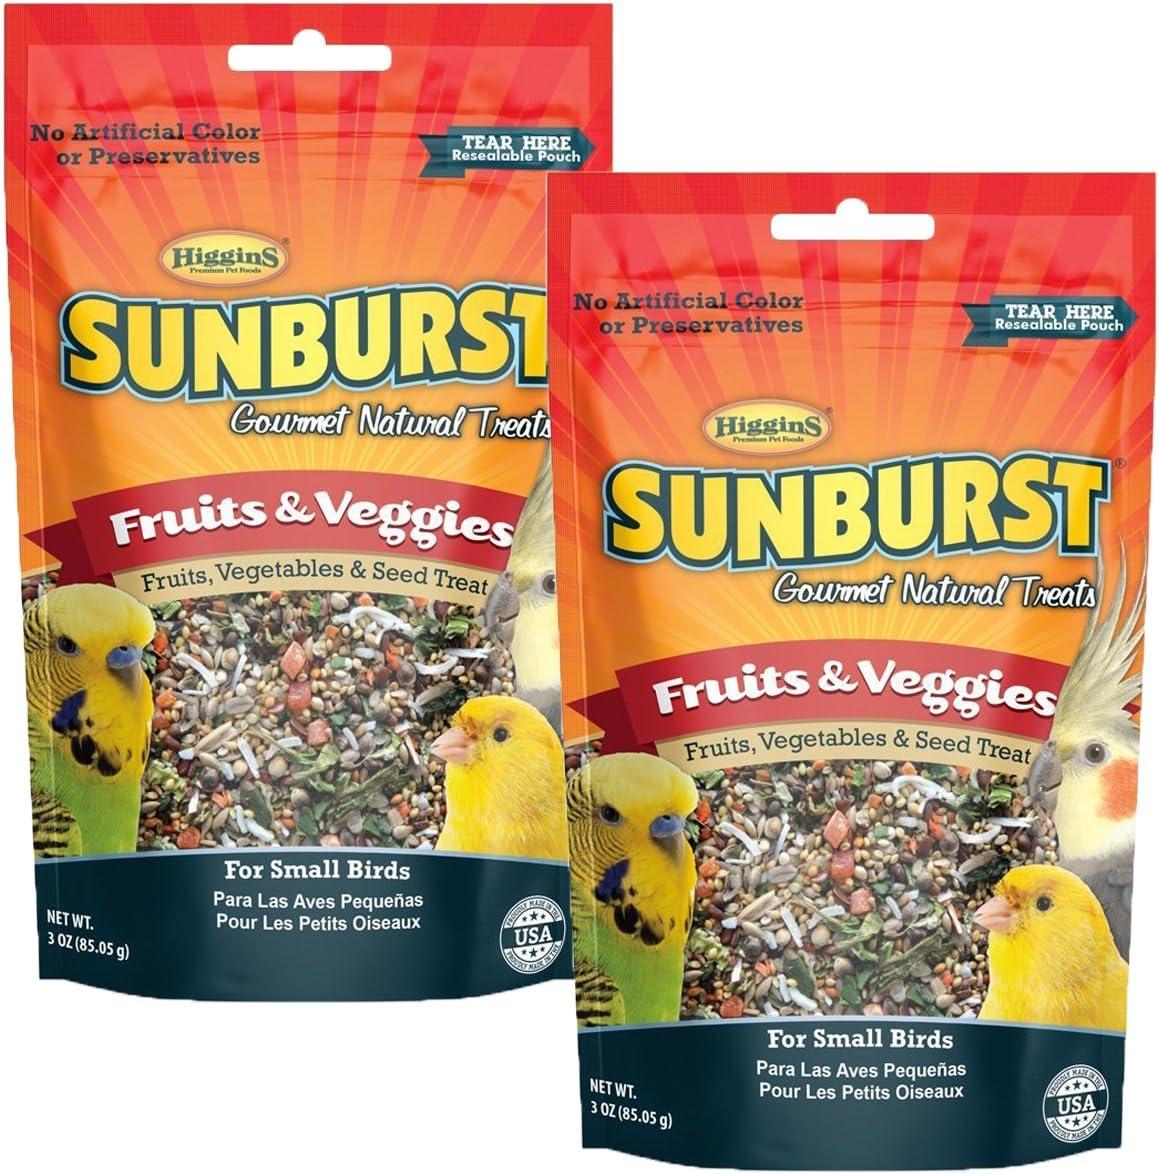 Higgins Sunburst Fruits & Veggies Gourmet Treats for Small Birds (2 Pack)